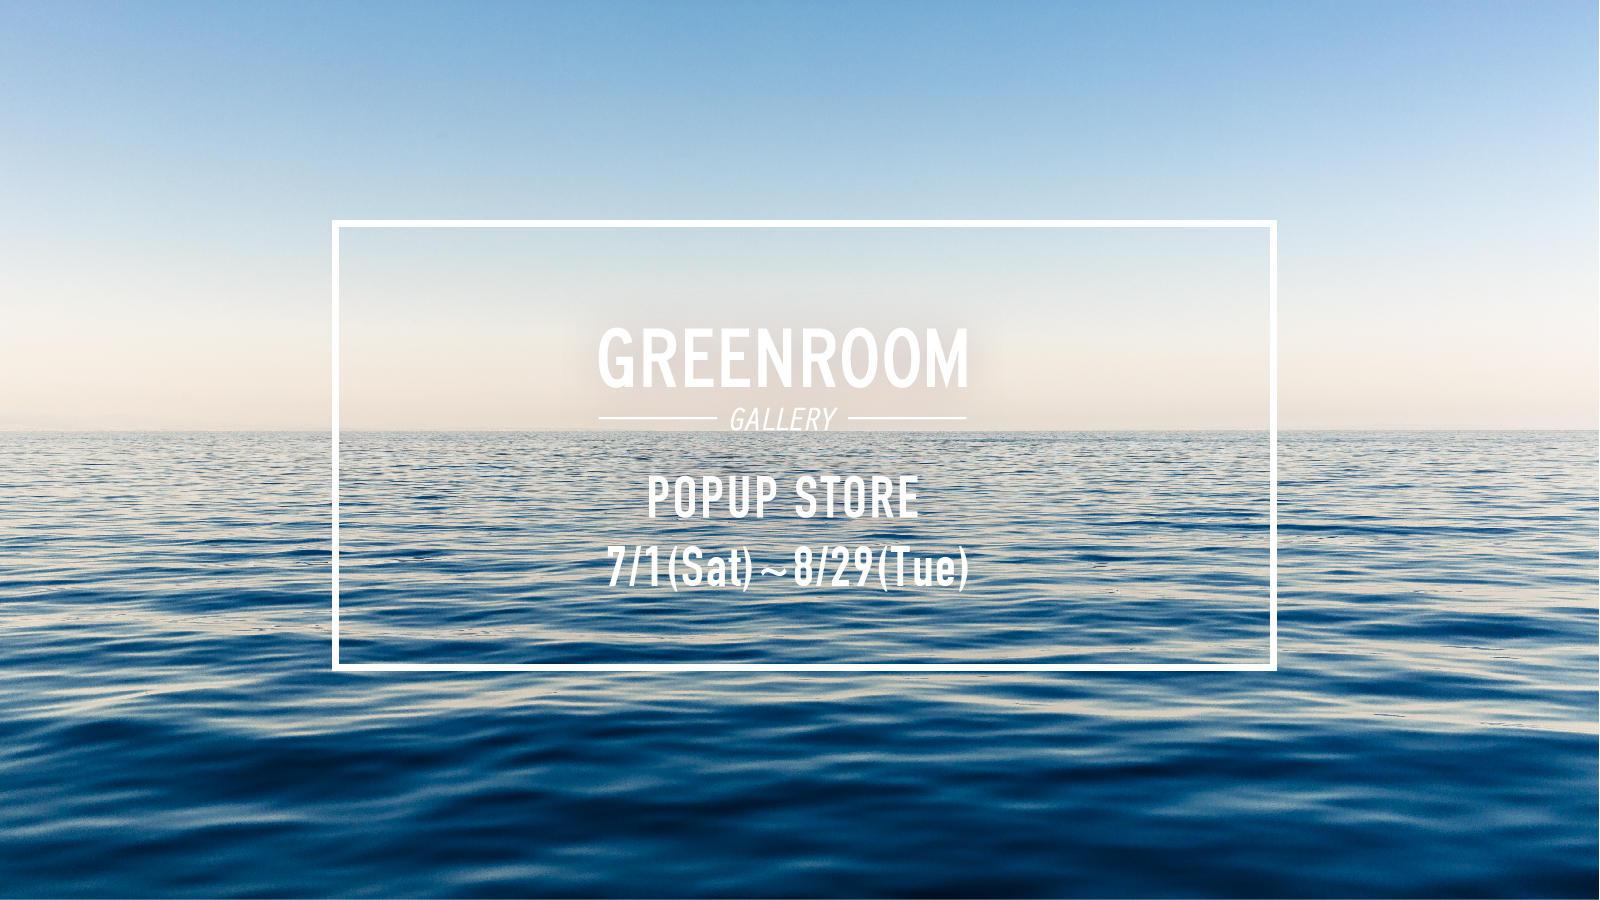 7.1sat-8.29tue 《GREENROOM GALLERY》 POPUP STORE OPEN